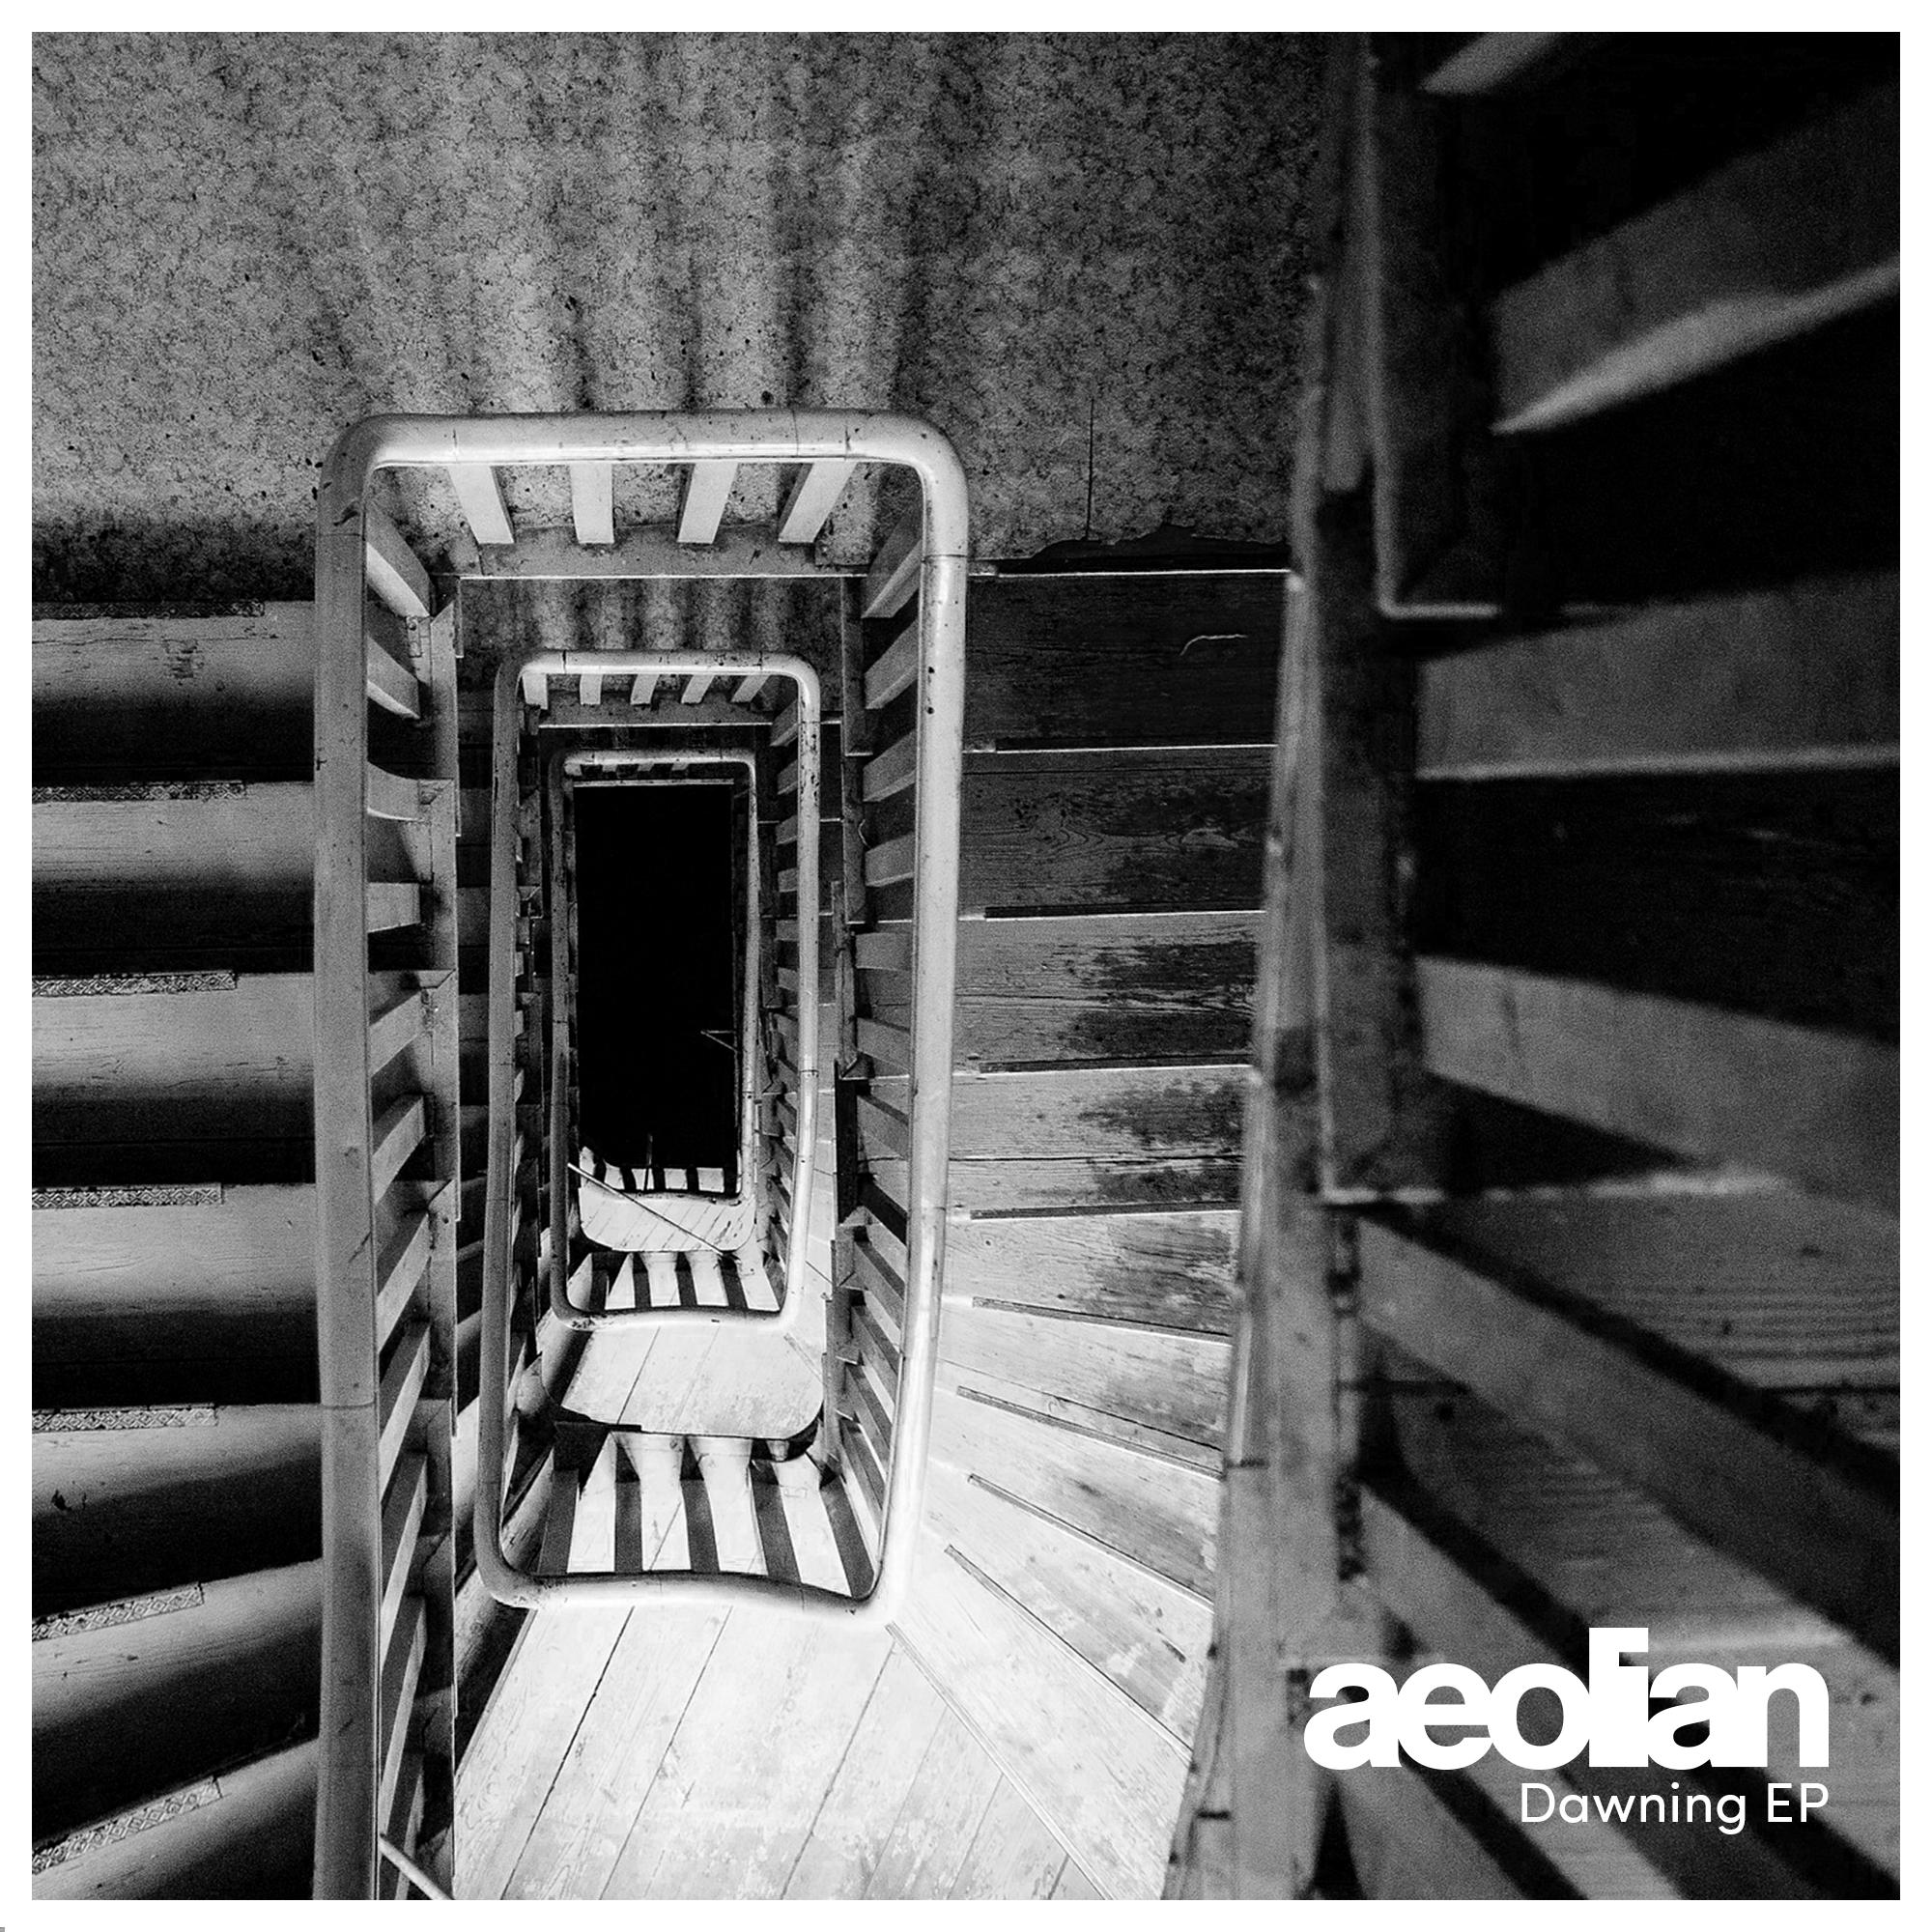 aeolian_-_dawning_ep_-_artwork.png